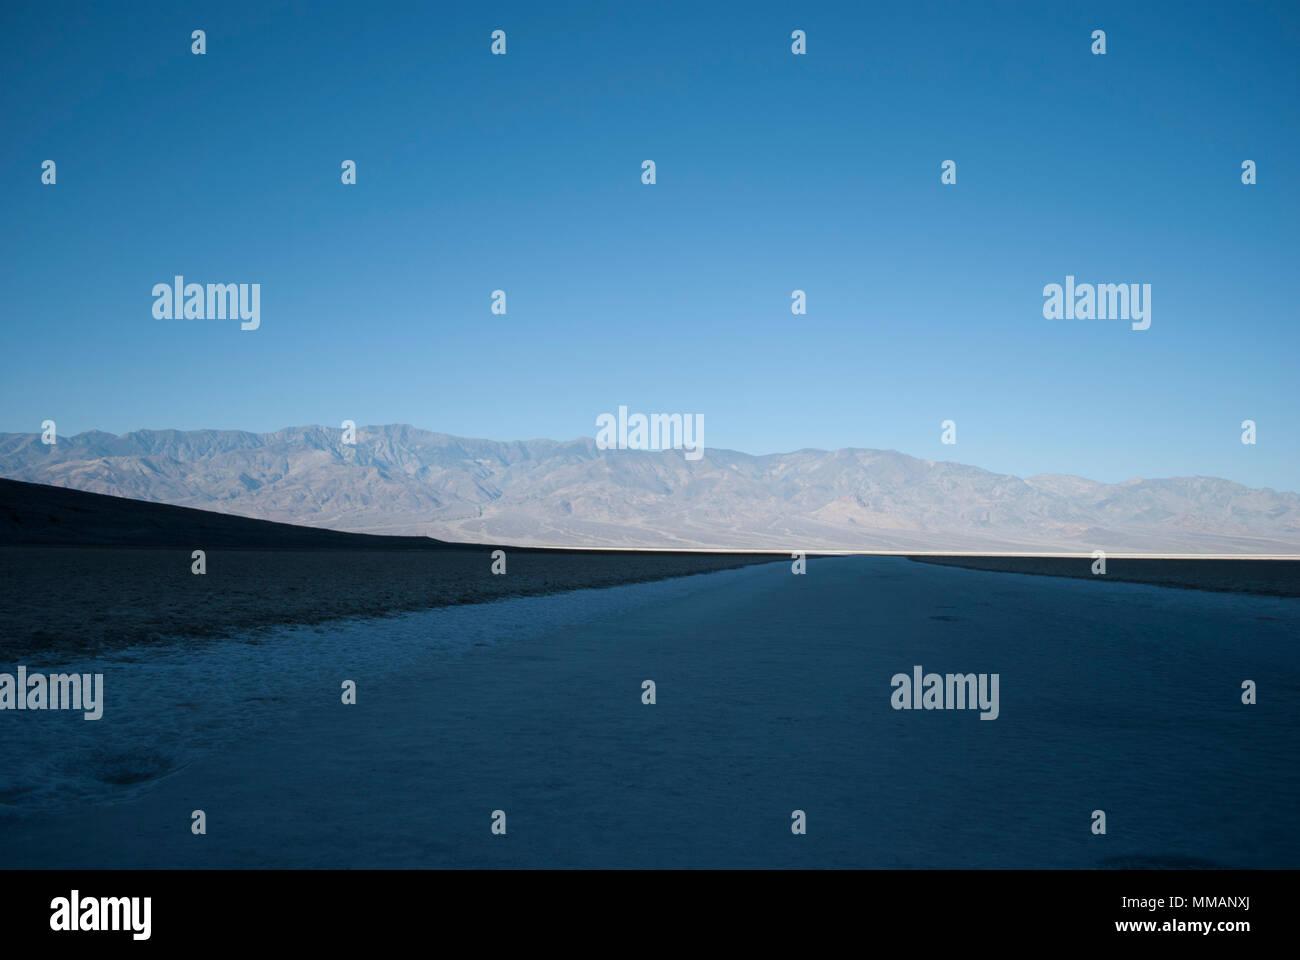 Mountains view. Sandy land. Desert. Hot weather. Summer. Vacation destination. Fantasy landscape - Stock Image